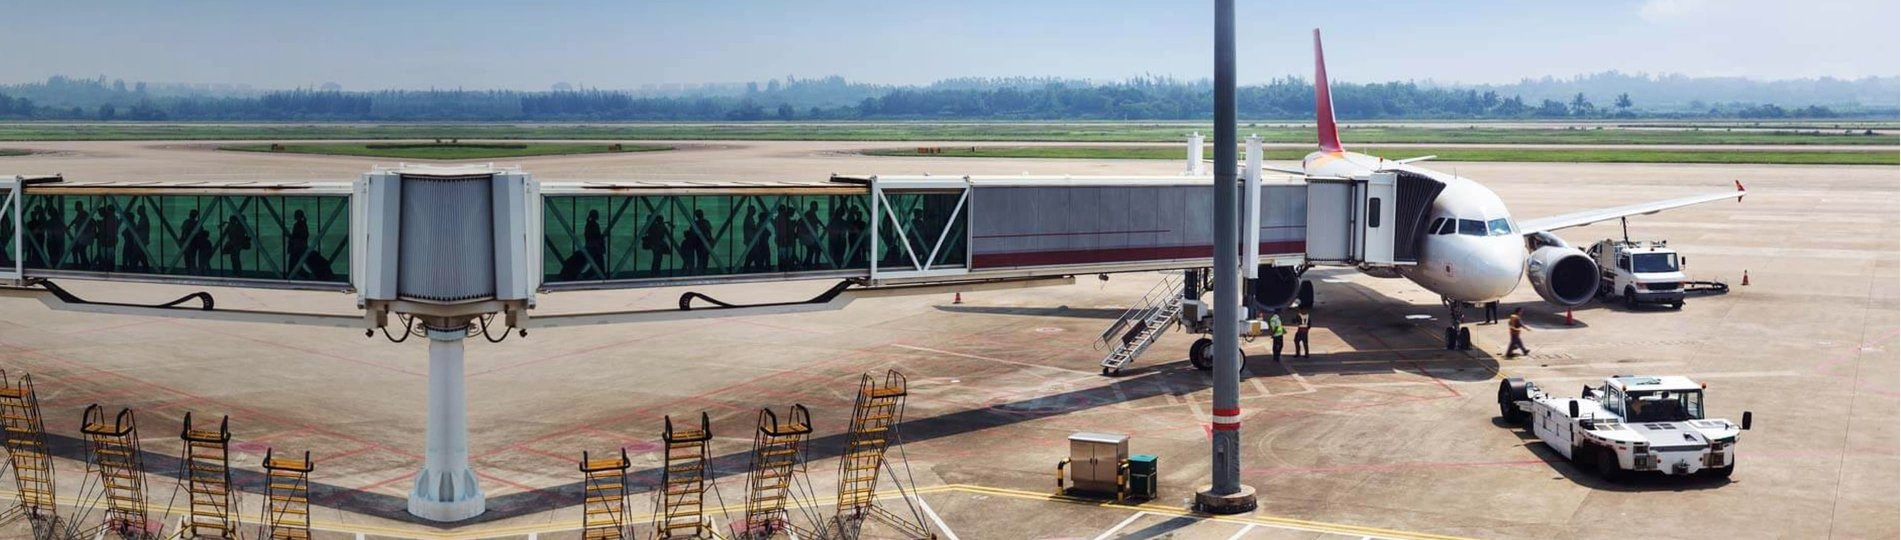 Flottenmanagement für Fluggesellschaften